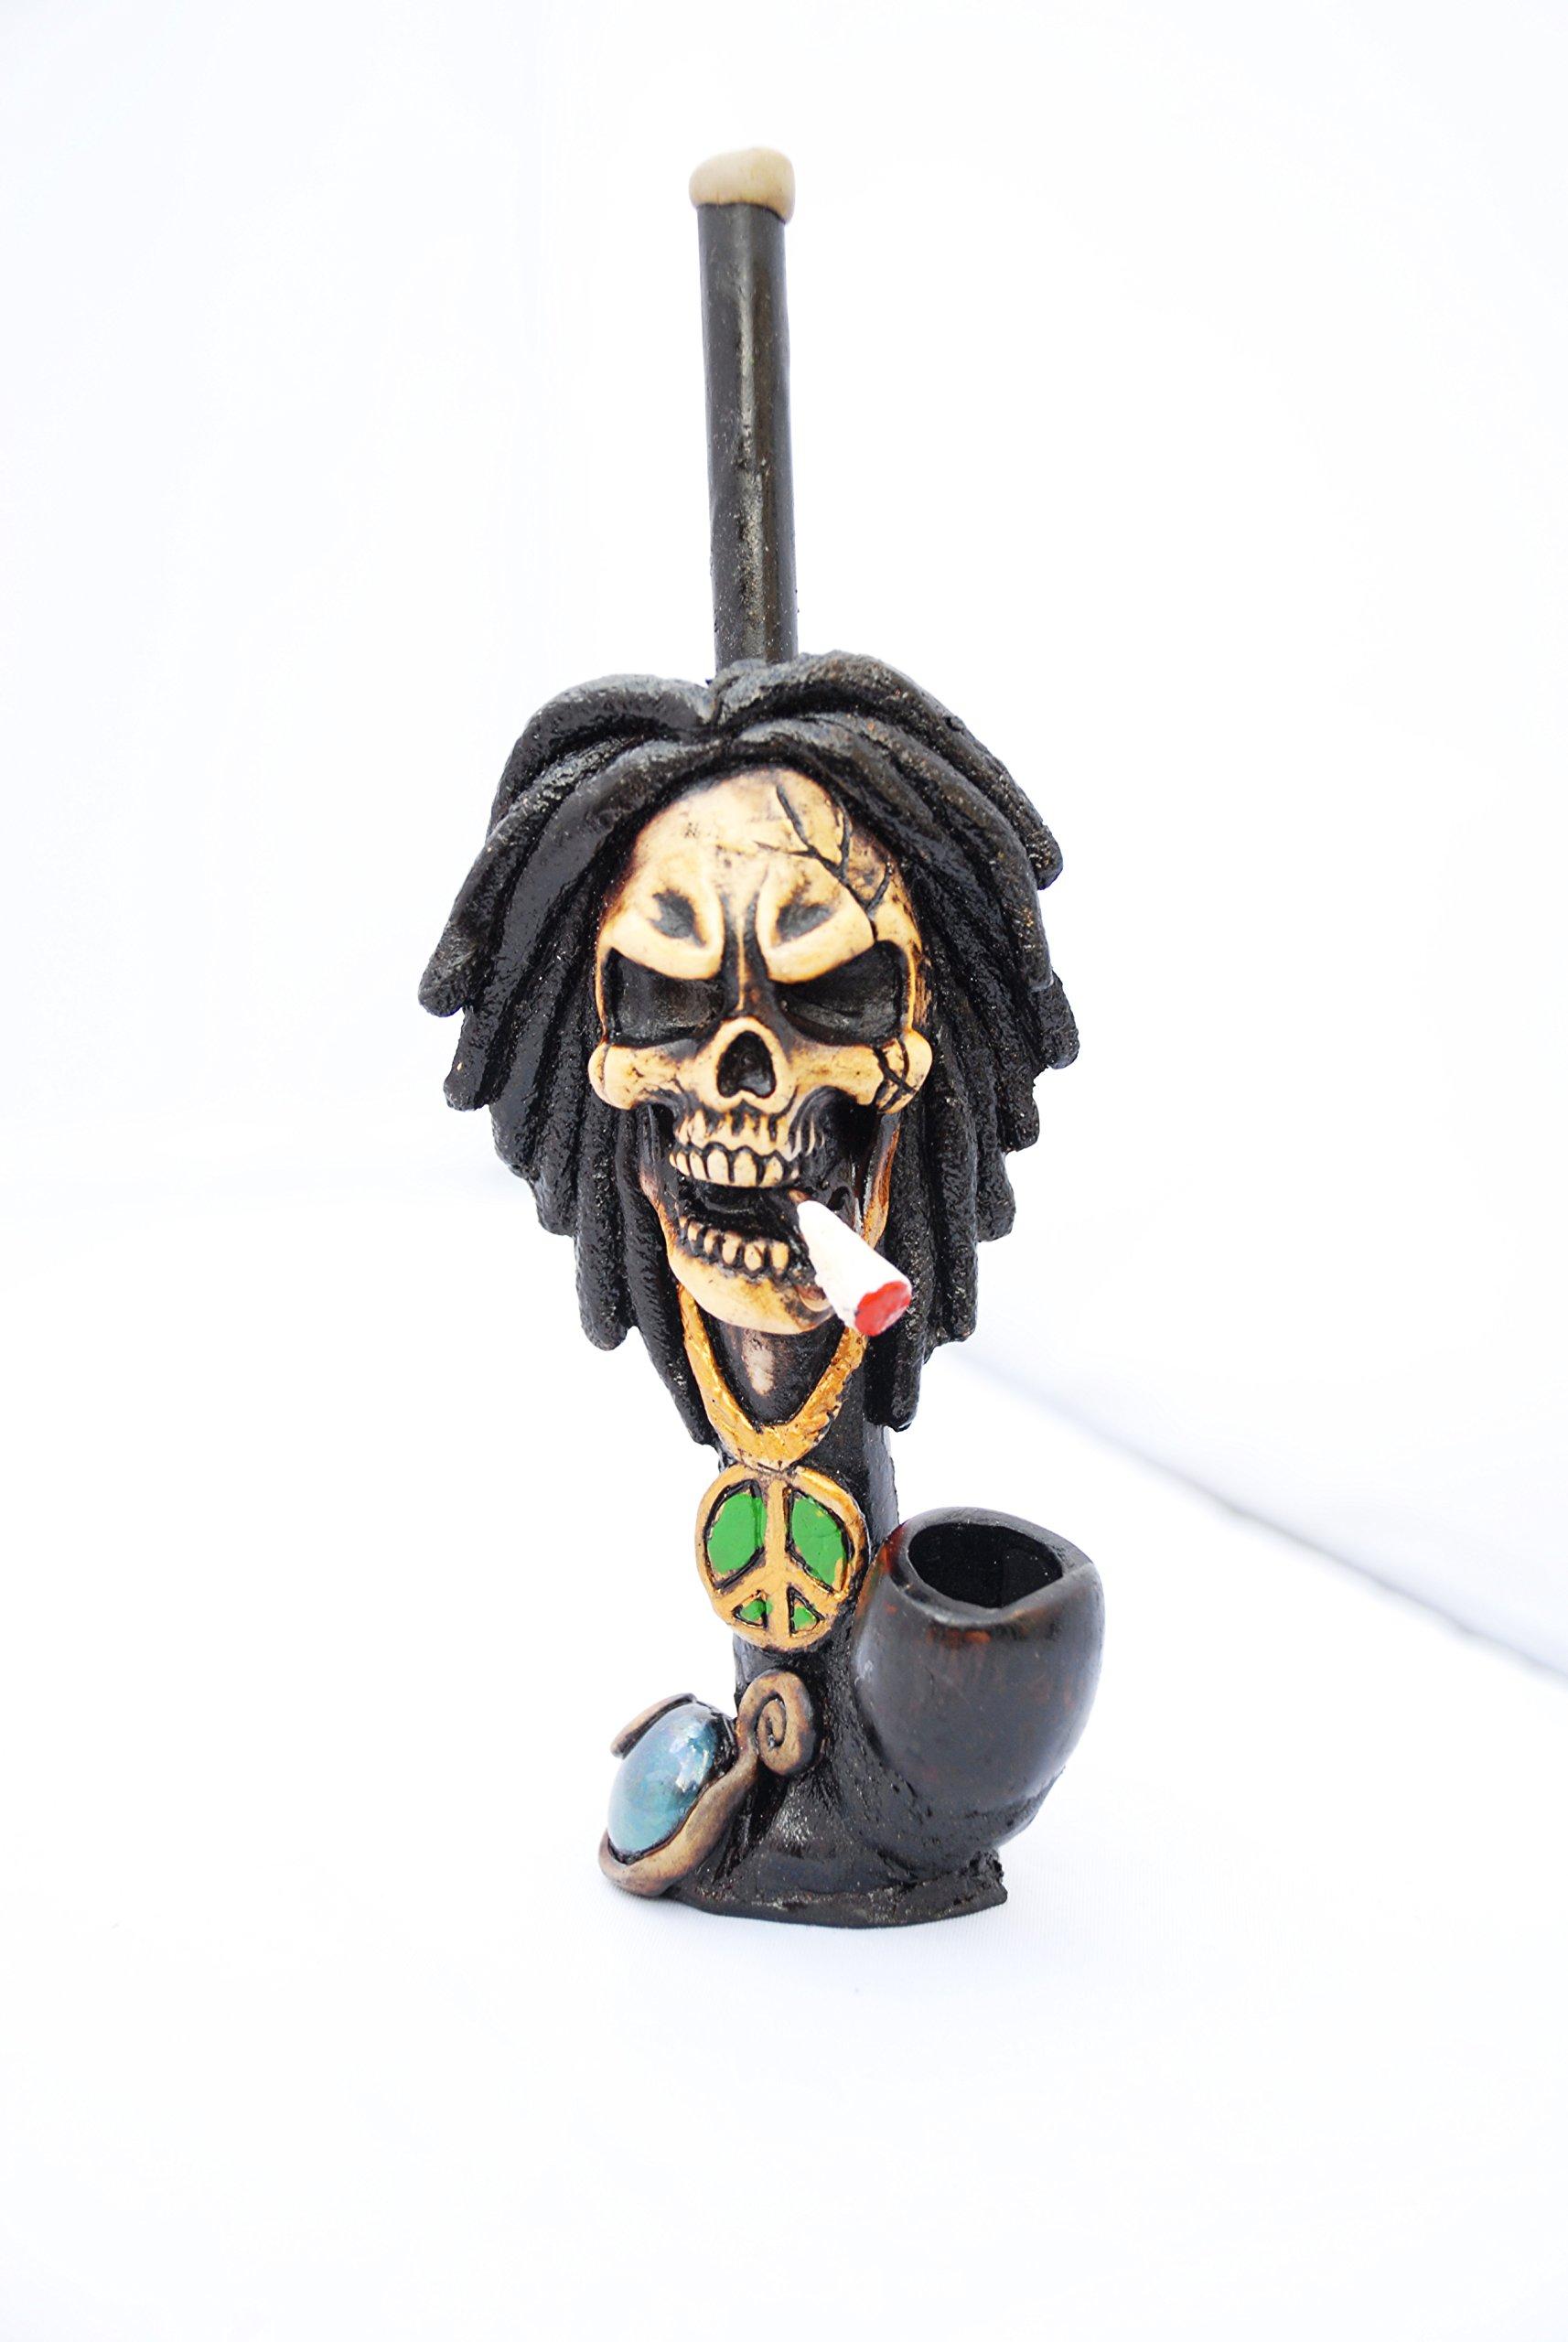 JCUNIVERSAL® - Handmade Tobacco Smoking Pipe Bob Marley Stype Smoking Skull Design